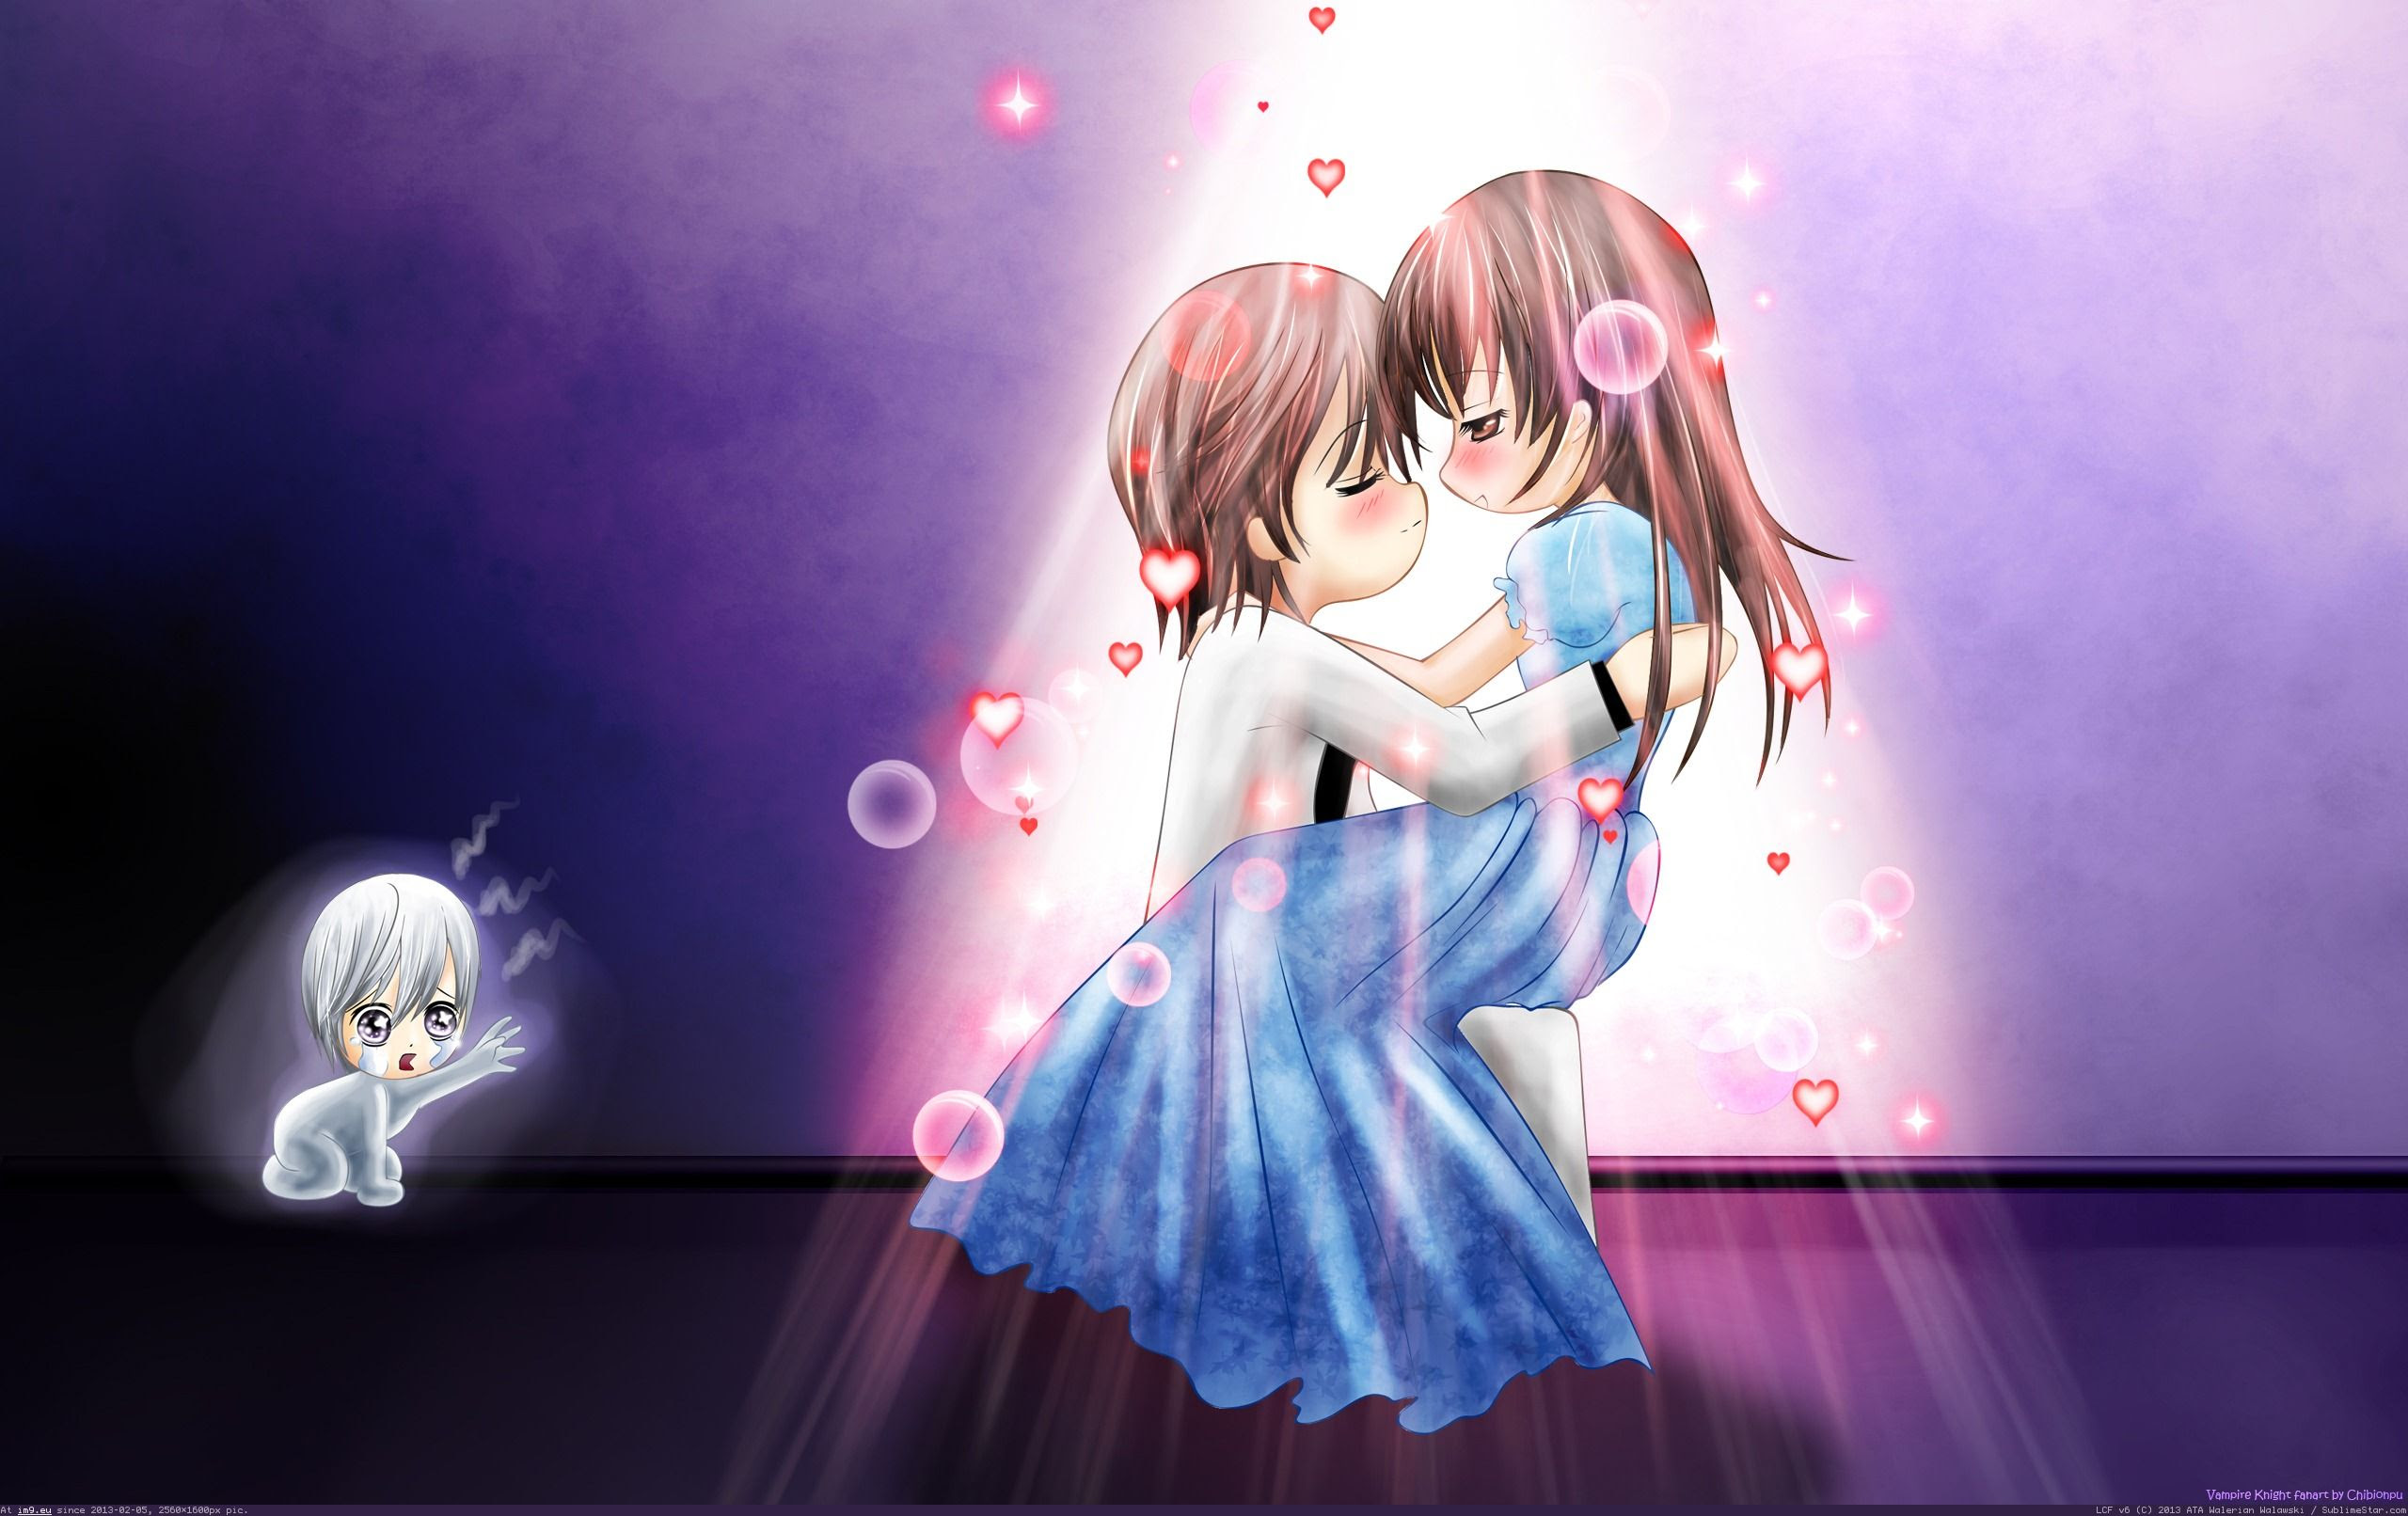 Anime Wallpapers Romantic Anime Couples Wallpaper